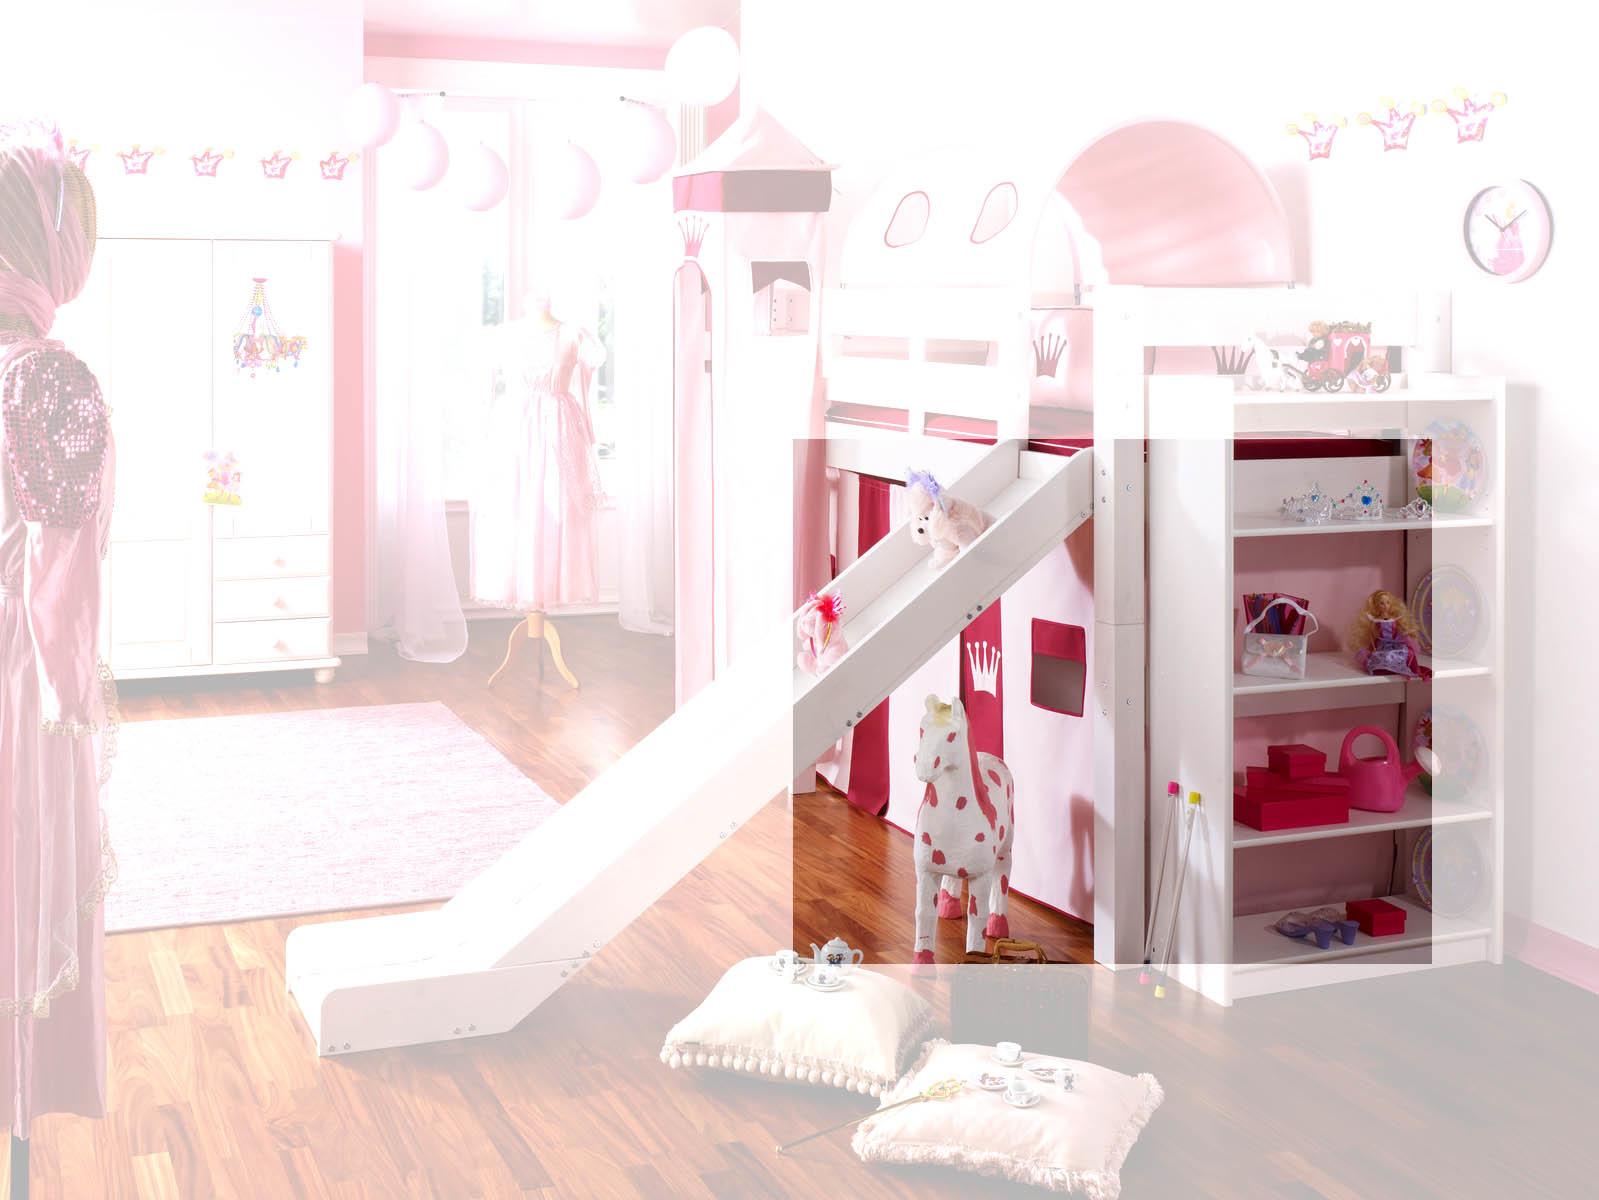 Prinzessinnenbett Hochbett mit Turm, weiß-rosa, Massivholz, Bild 5